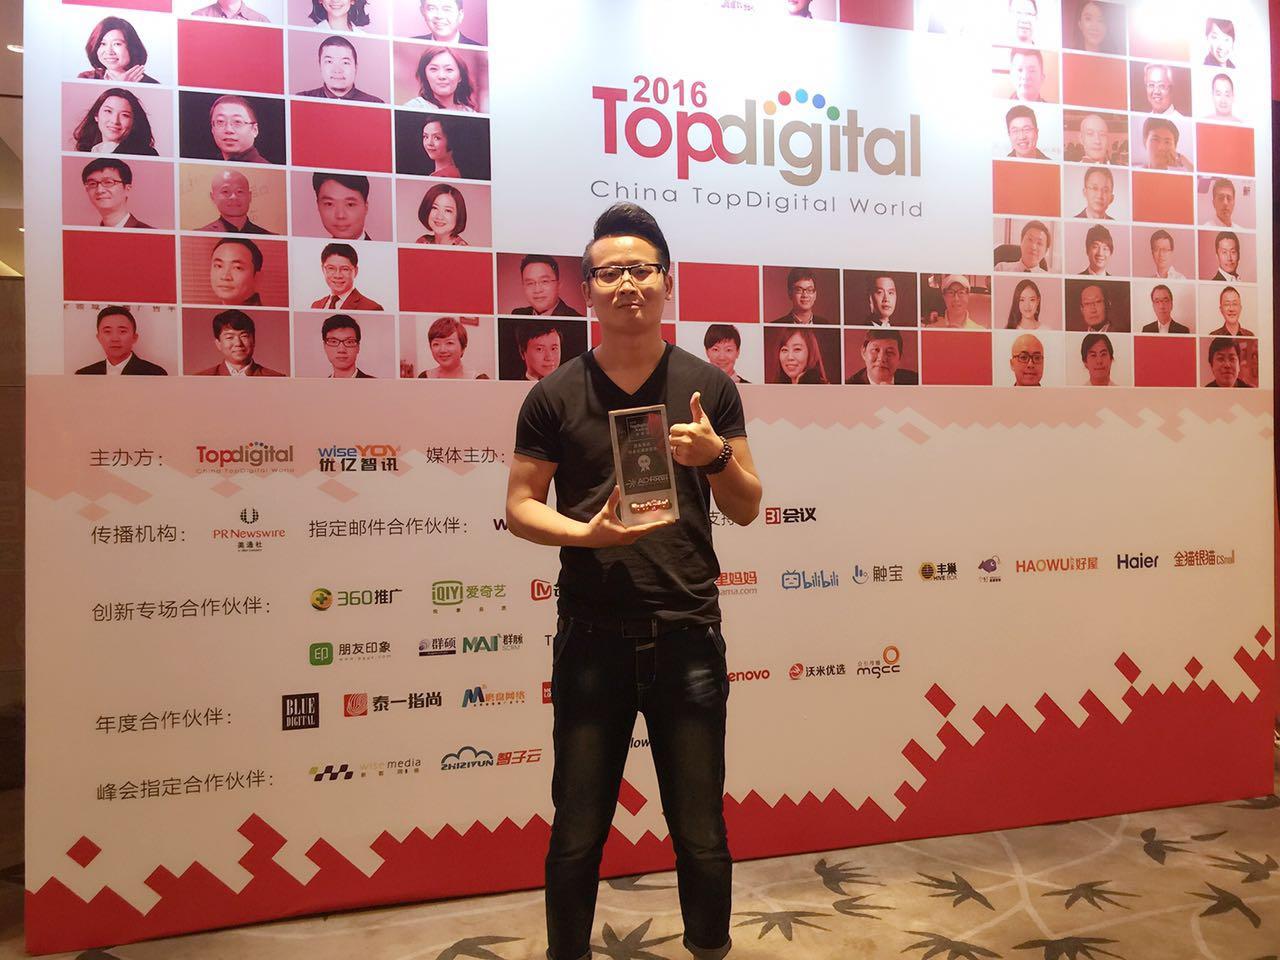 2016topdigital现场颁奖图片.jpg